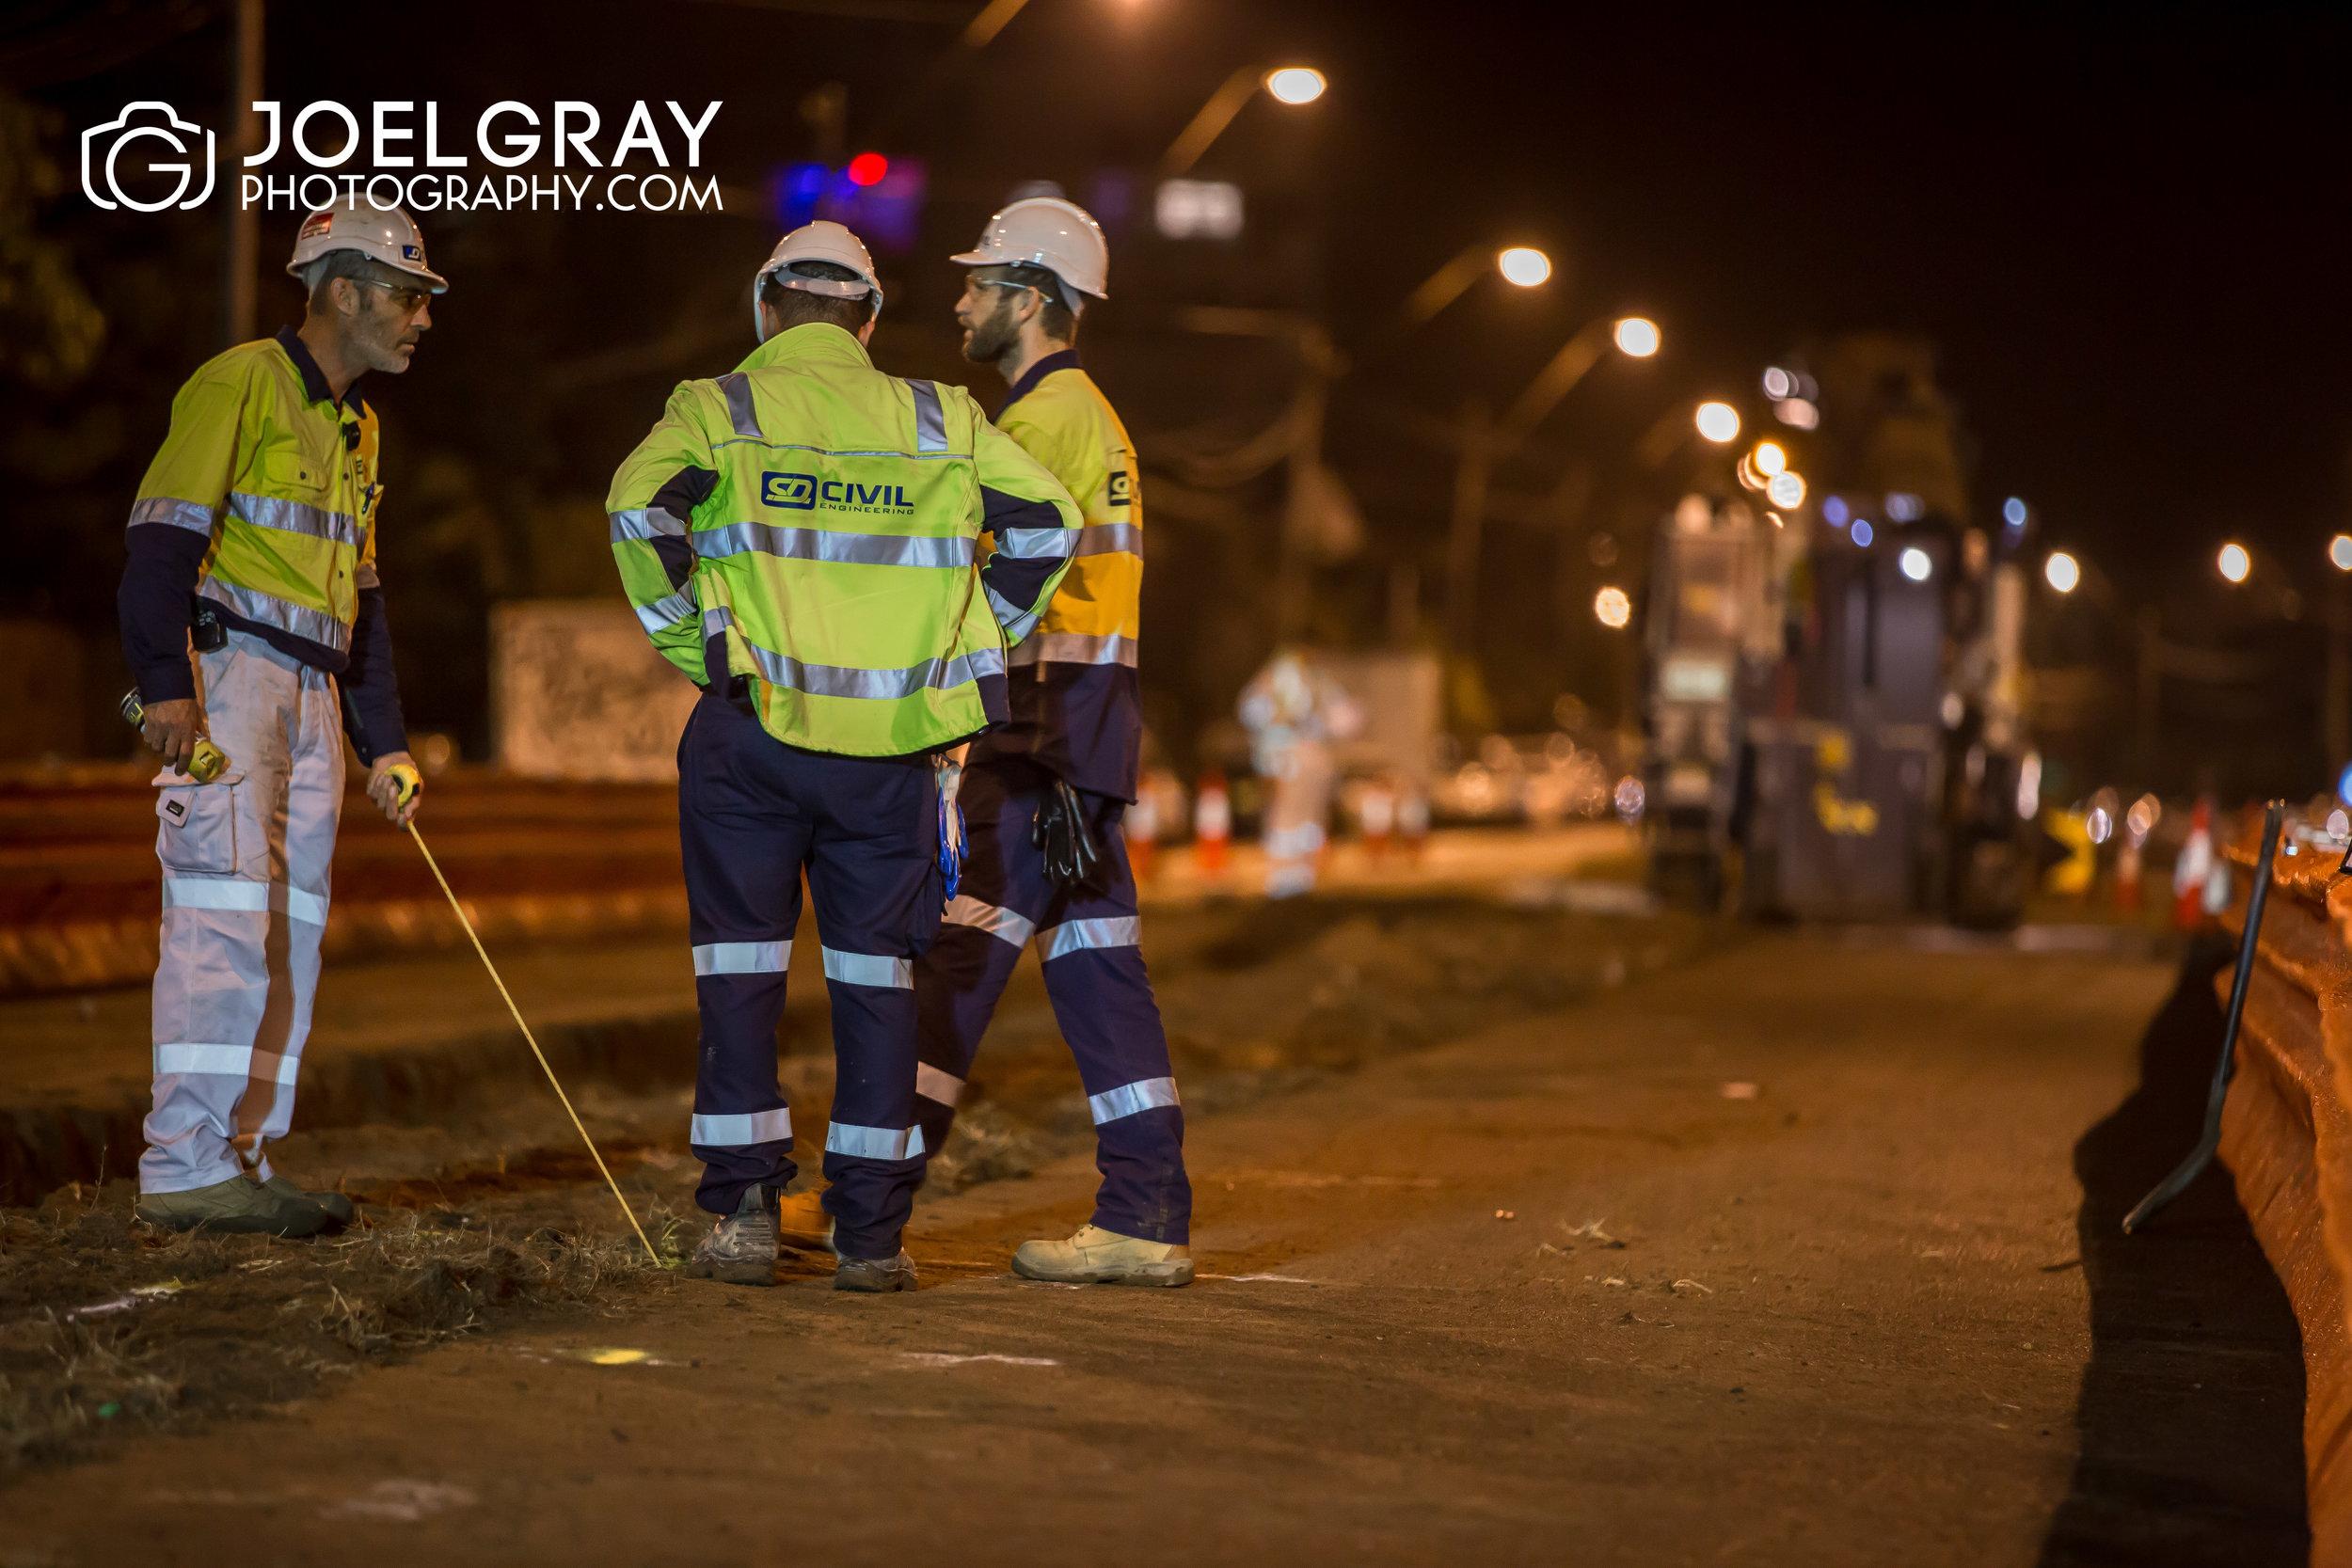 sd-civil-roadworks-contractor-sydney-photographer-1800829994